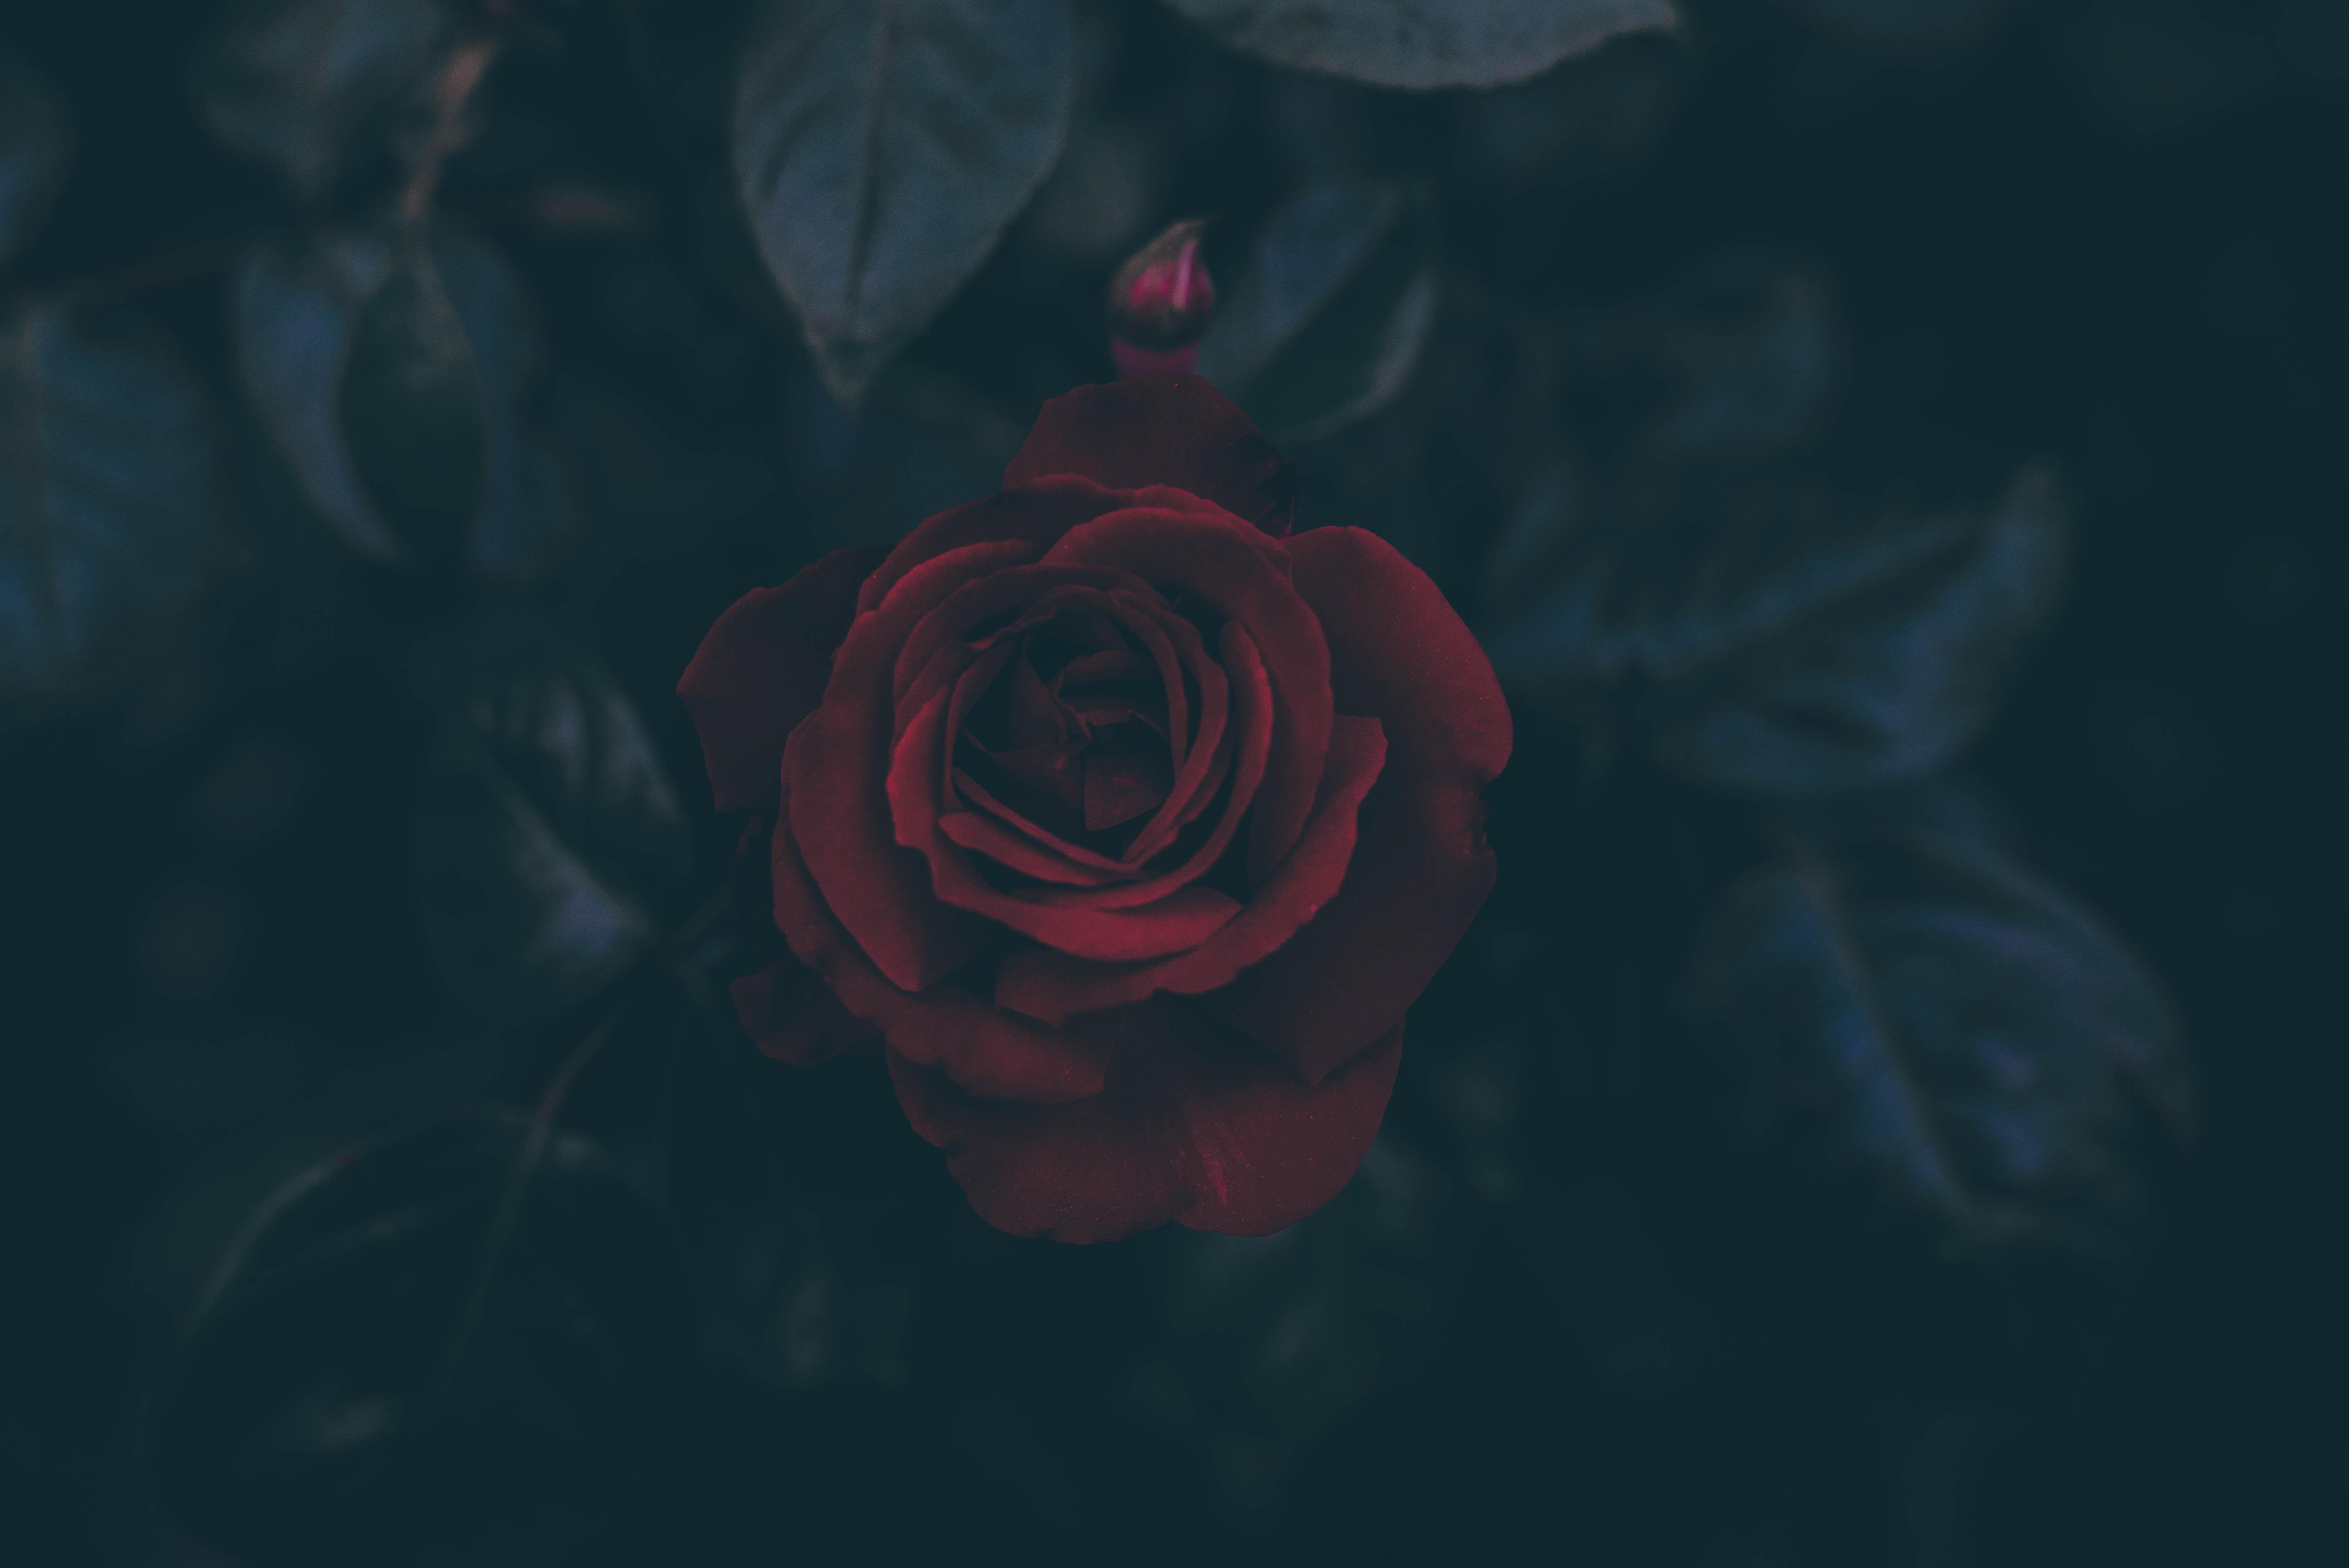 Soft Petals & Sharp Thorns stories